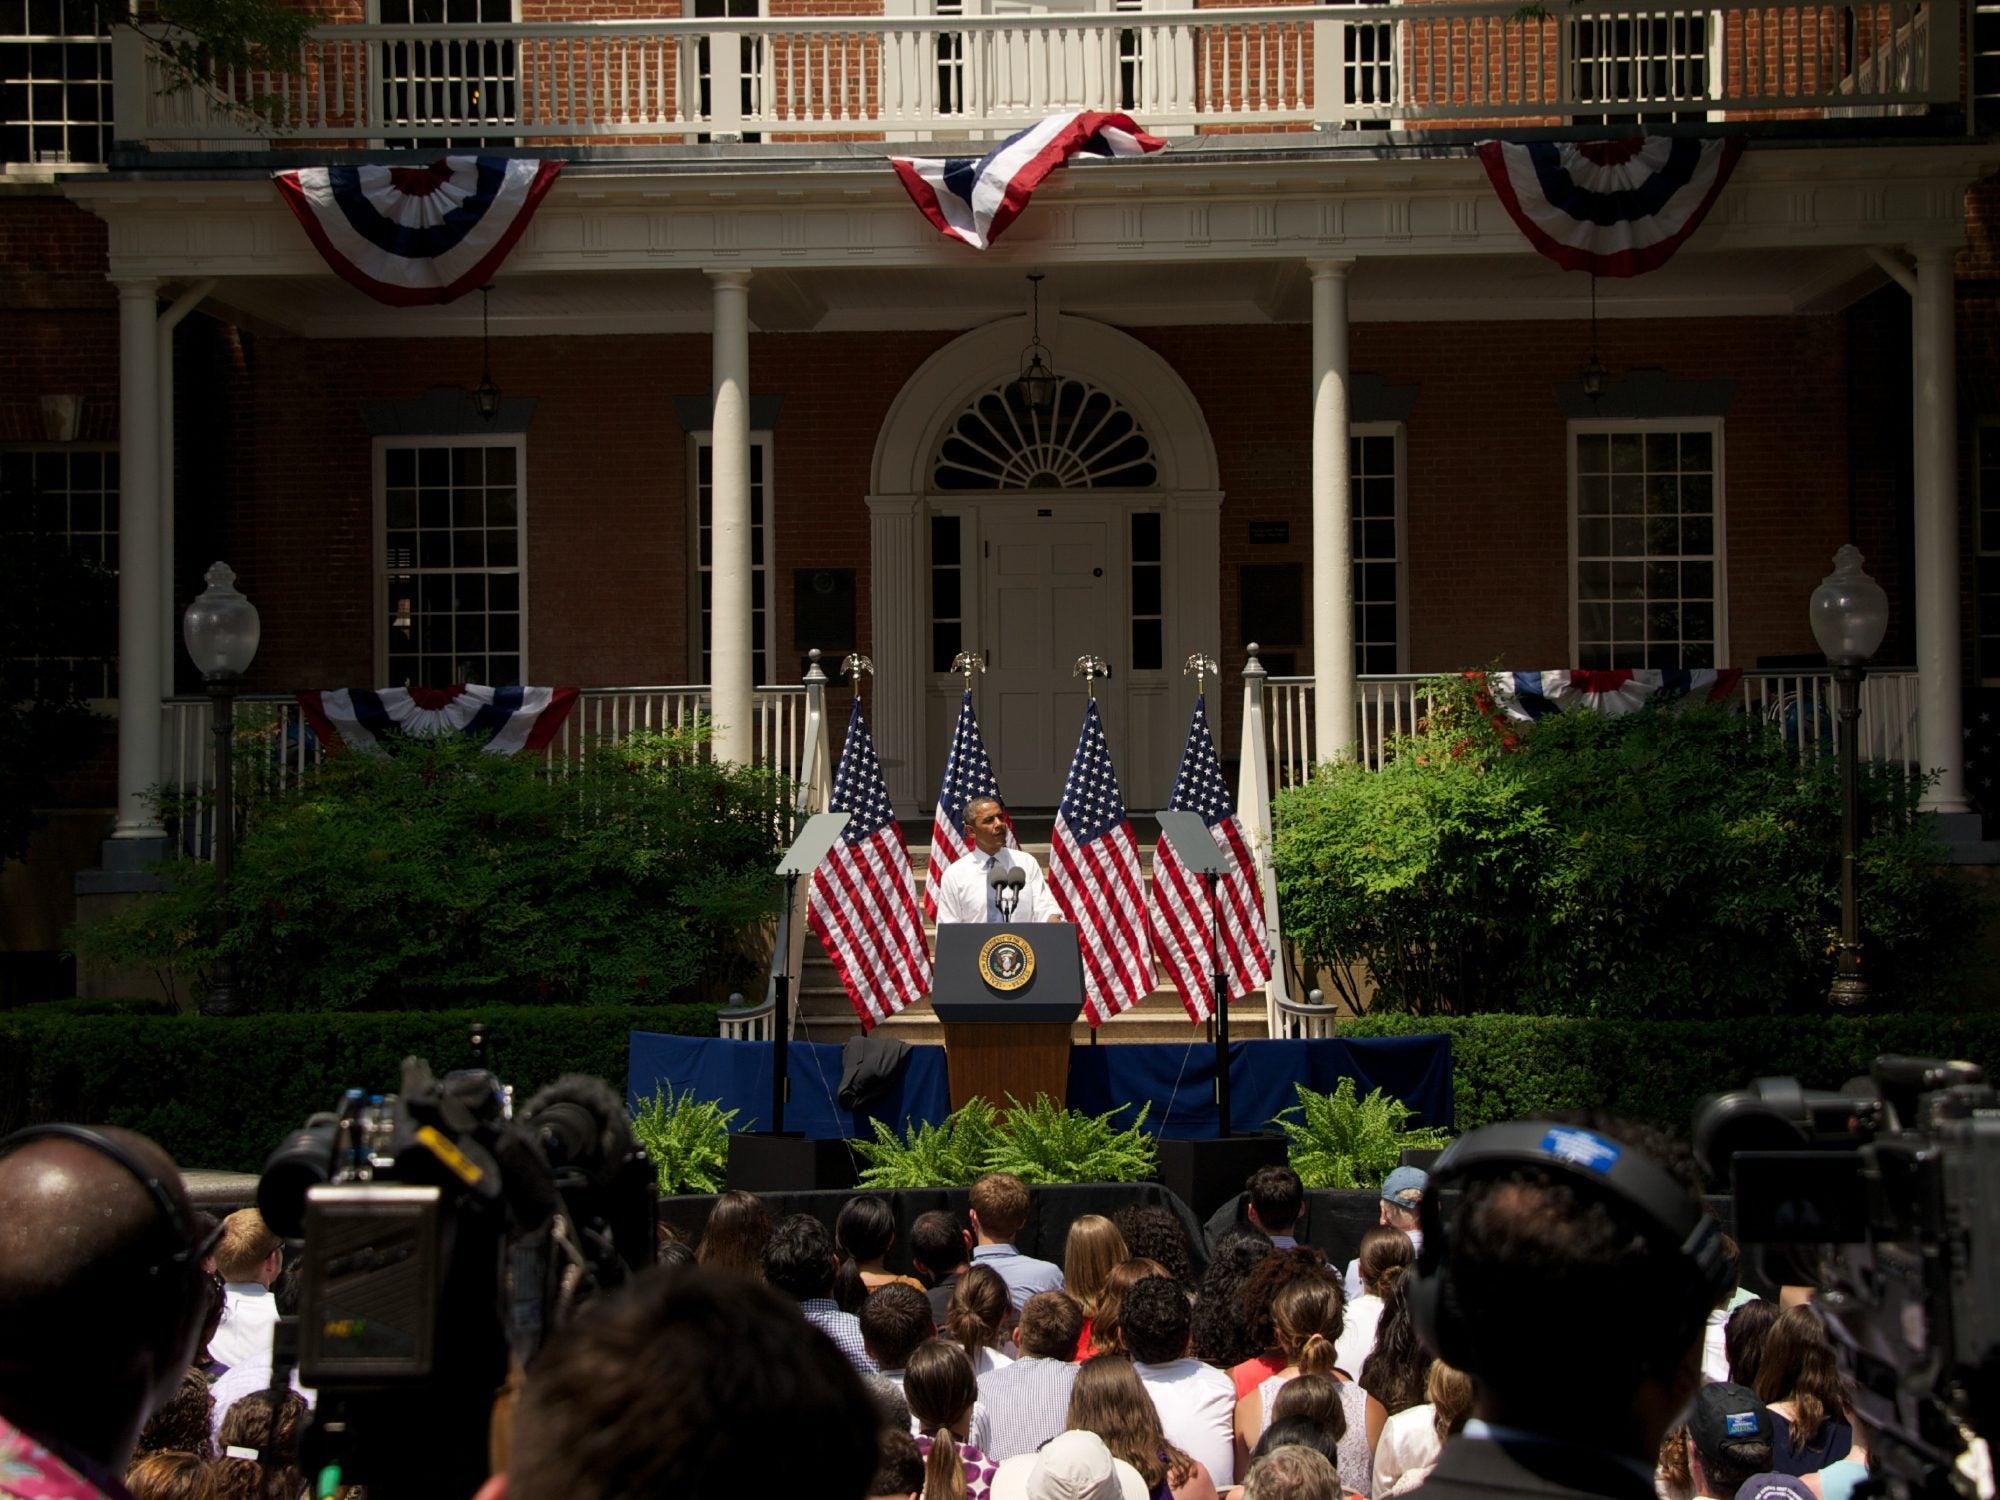 President Barack Obama speaking in front of Old North